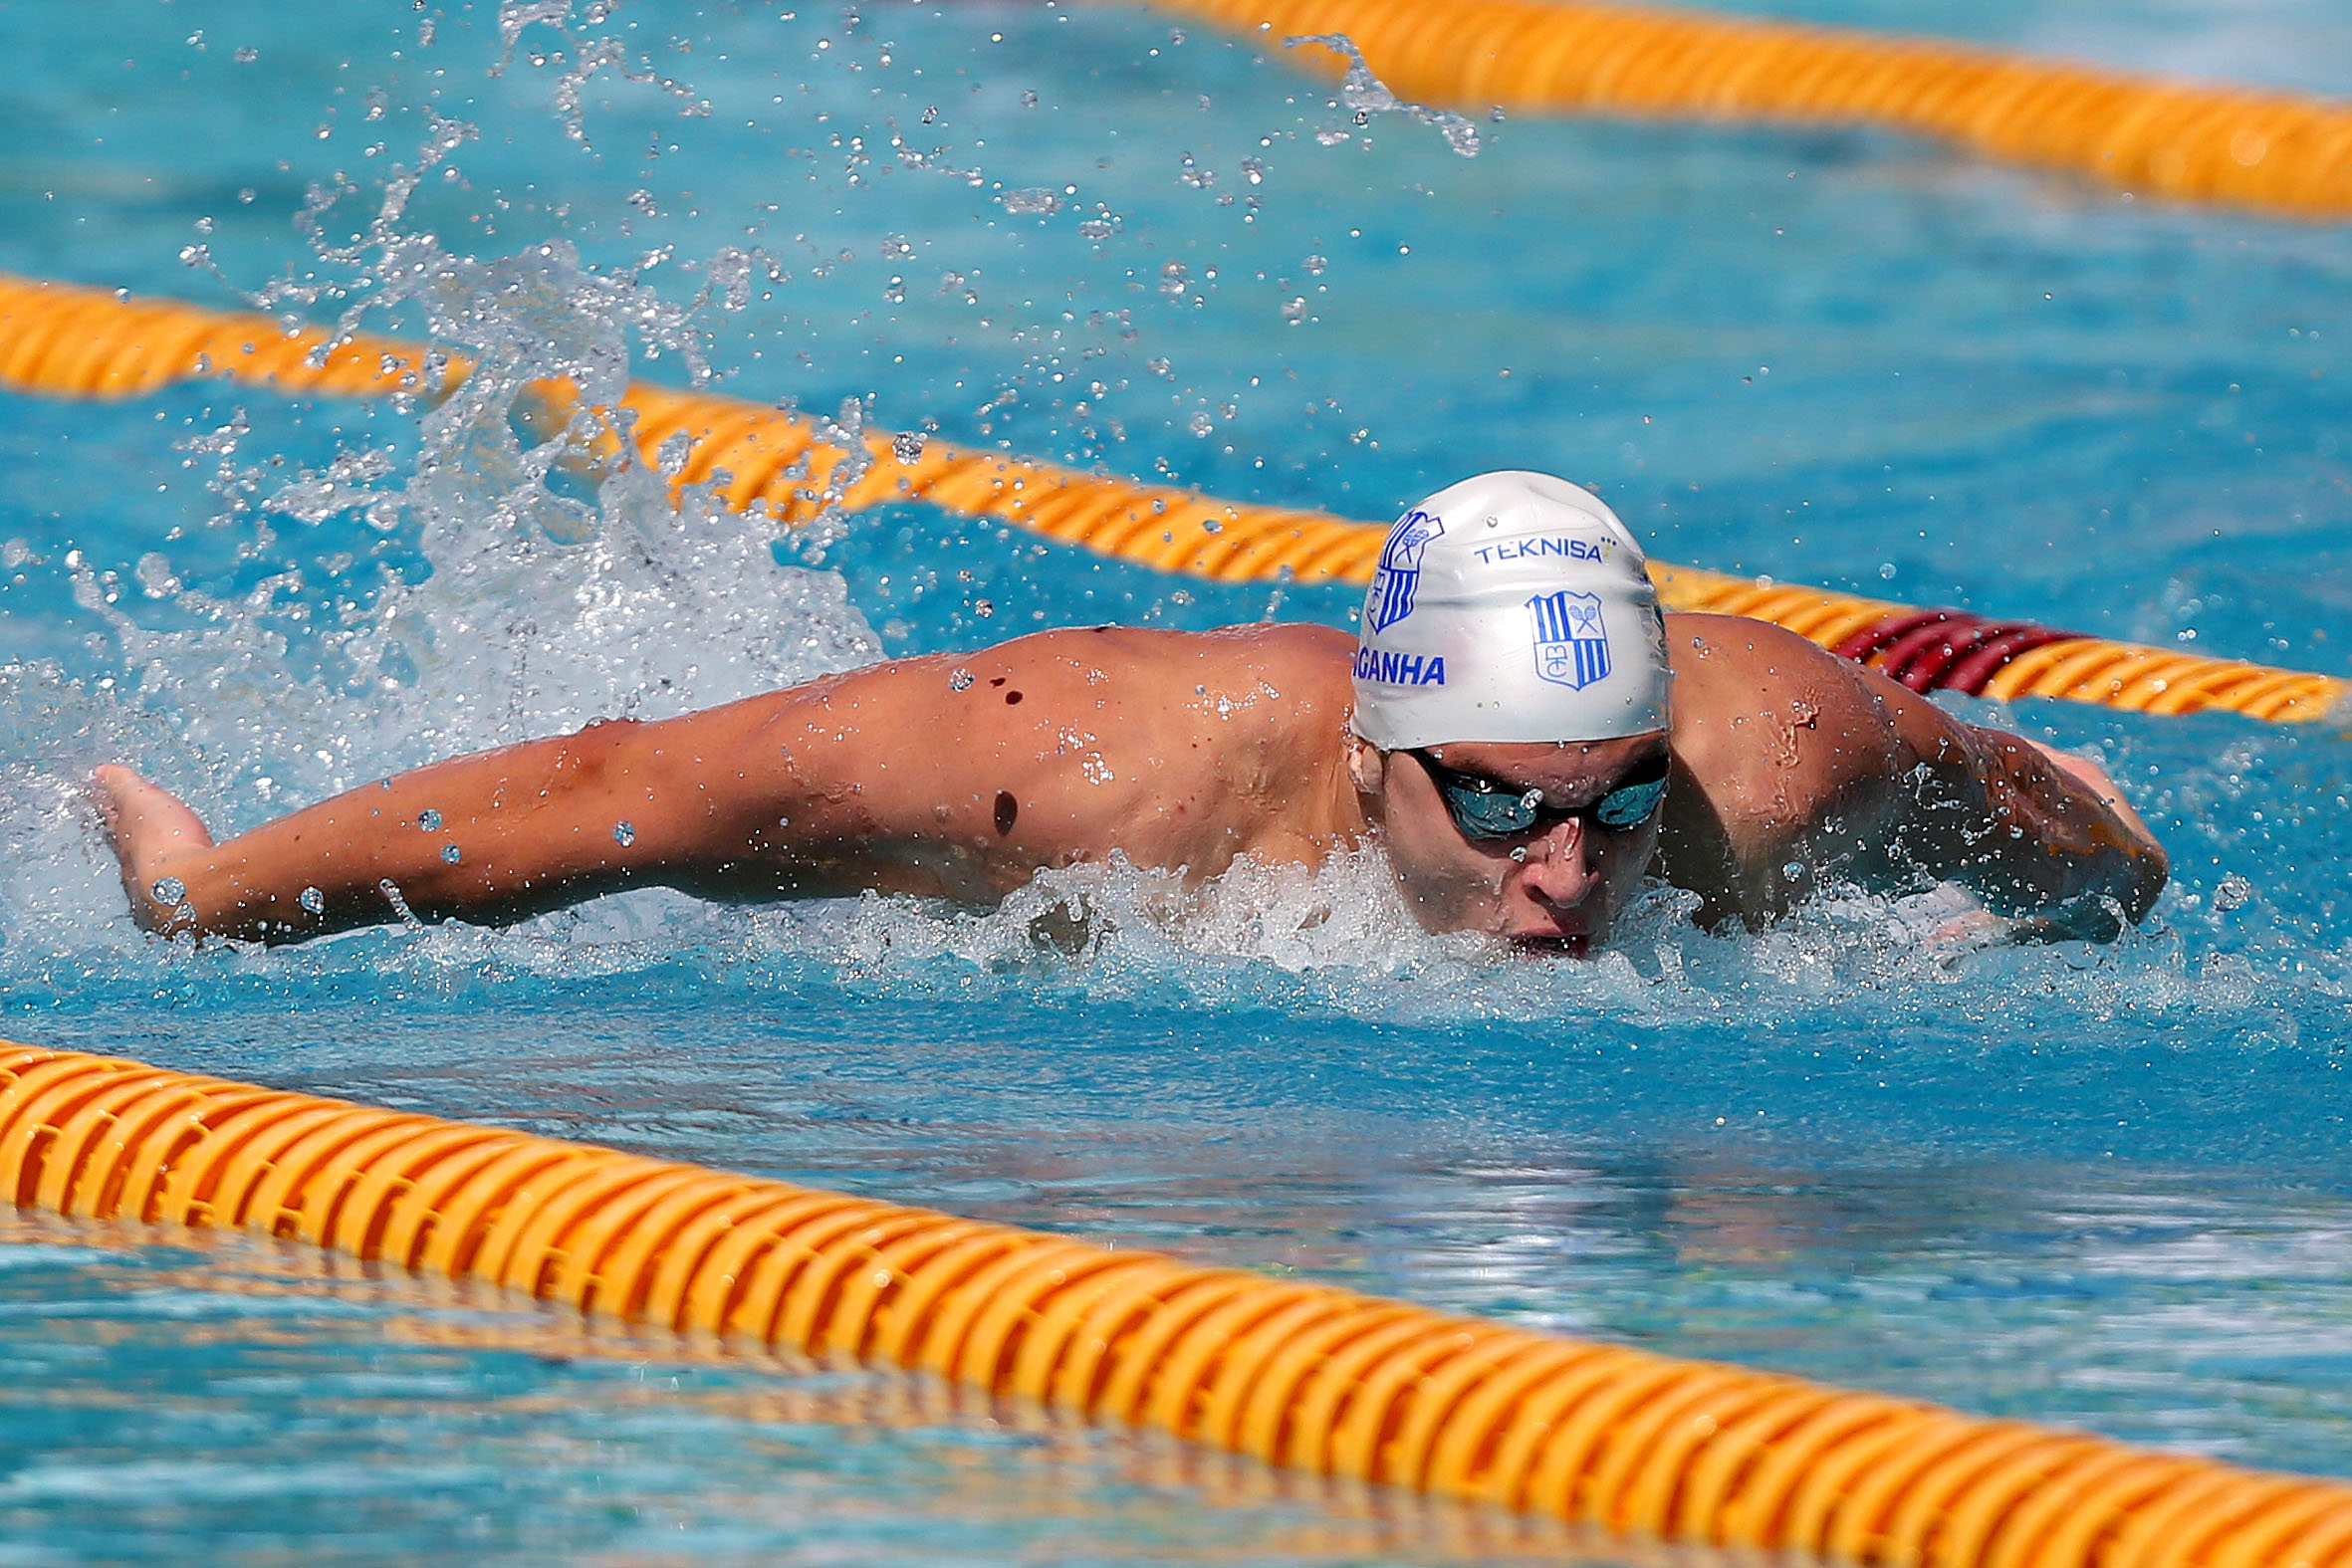 Victor Baganha, de 18 anos, está confiante para a final dos 100m borboleta